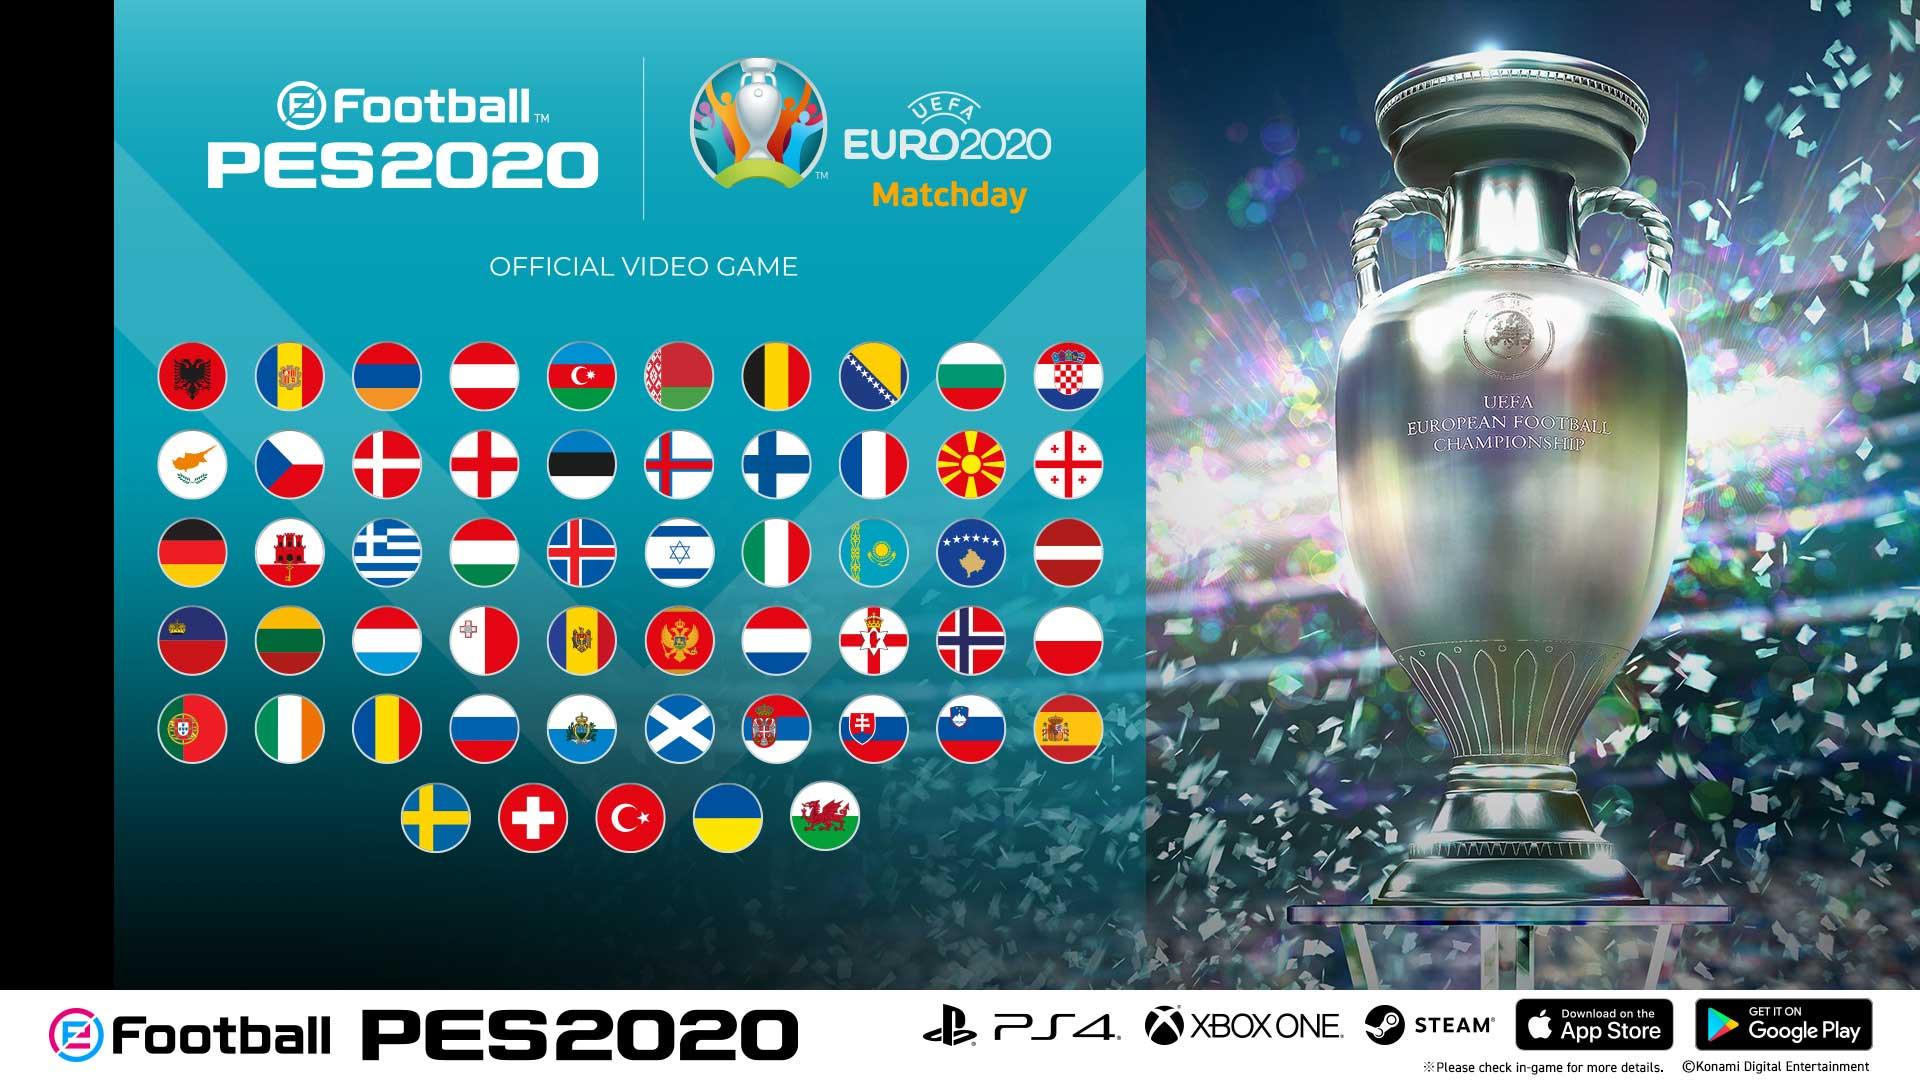 PES2020 EURO2020 Campaign B 0 babt